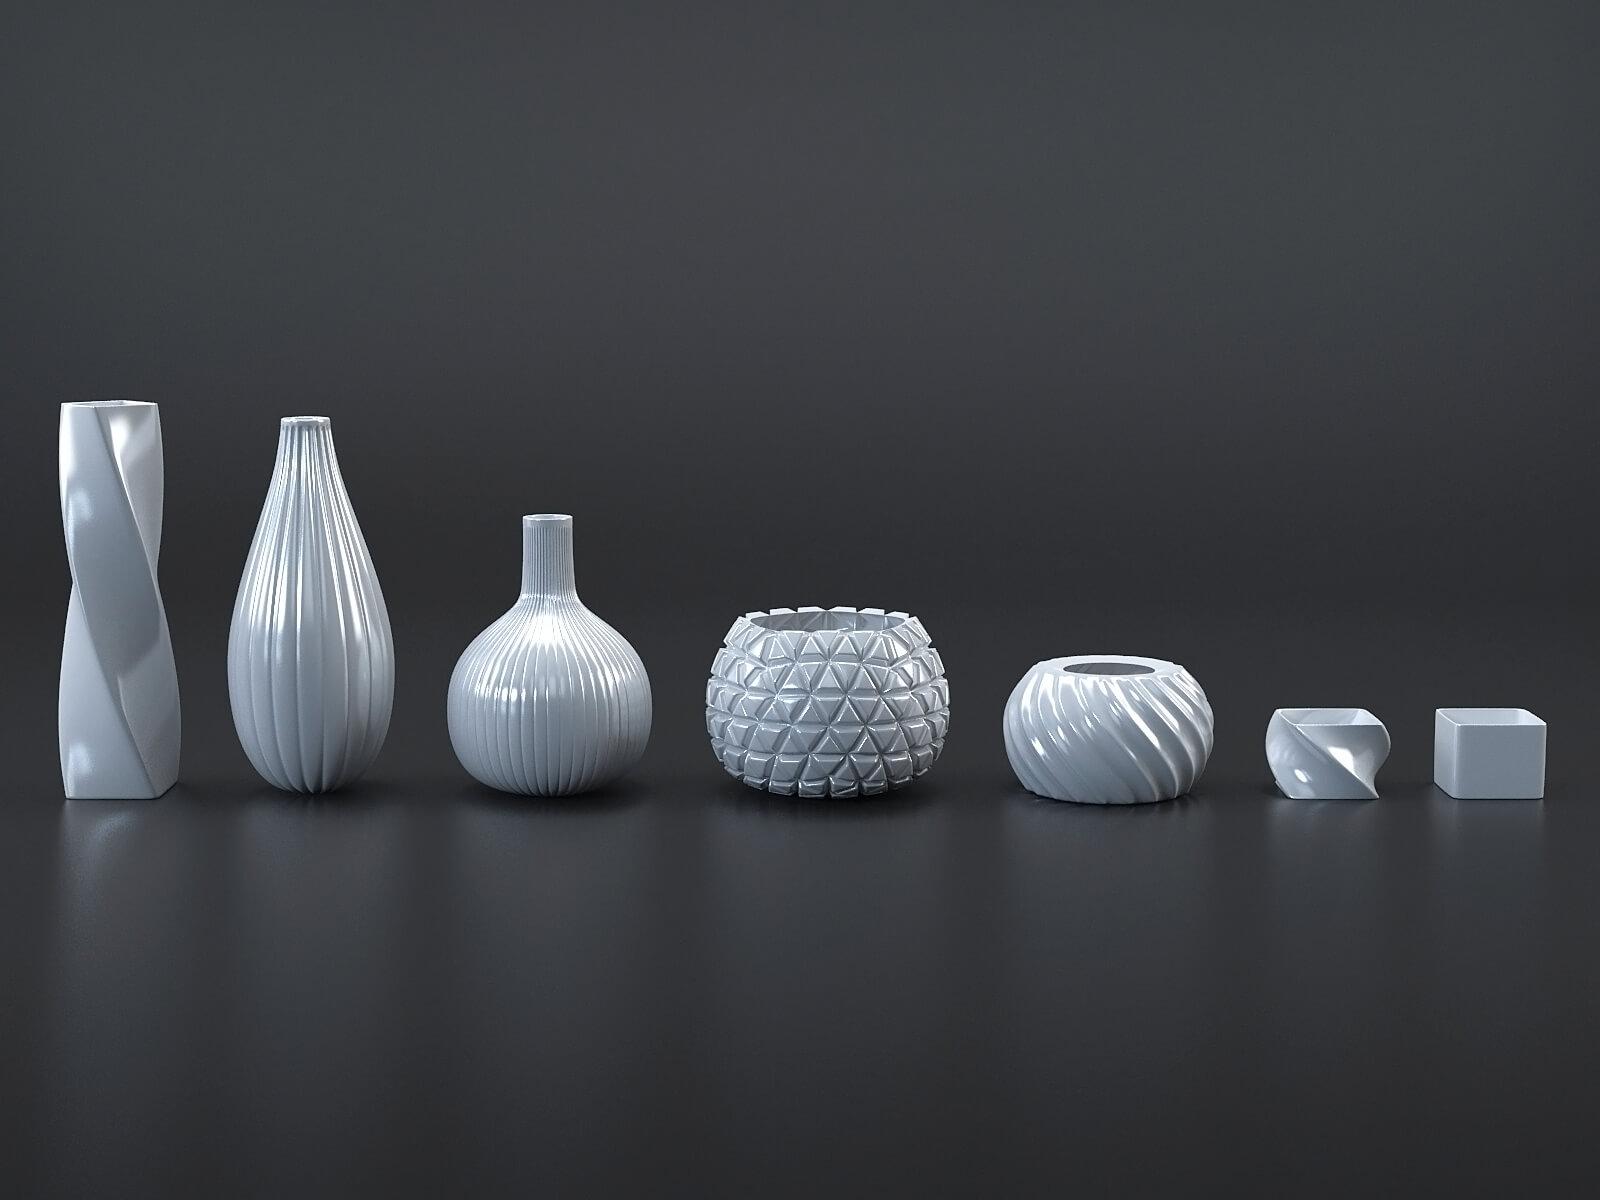 White/Black vases collection